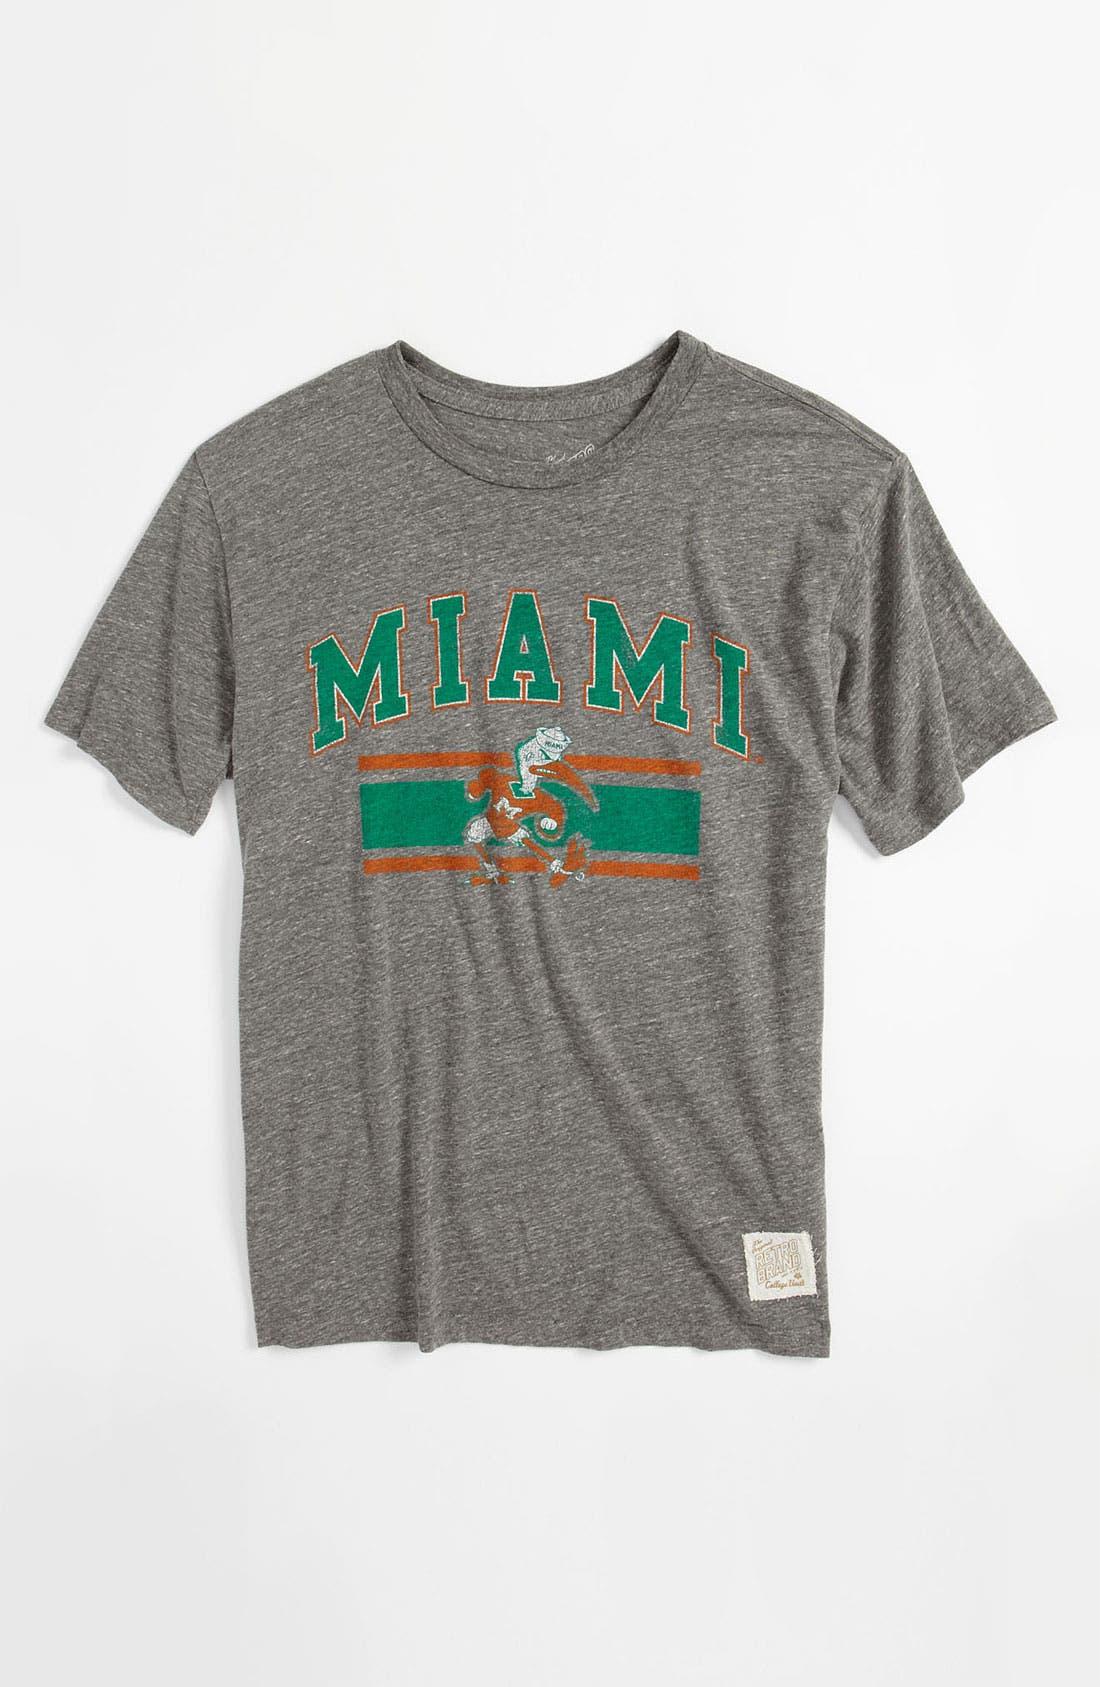 Alternate Image 1 Selected - Retro Brand 'Miami' T-Shirt (Big Boys)